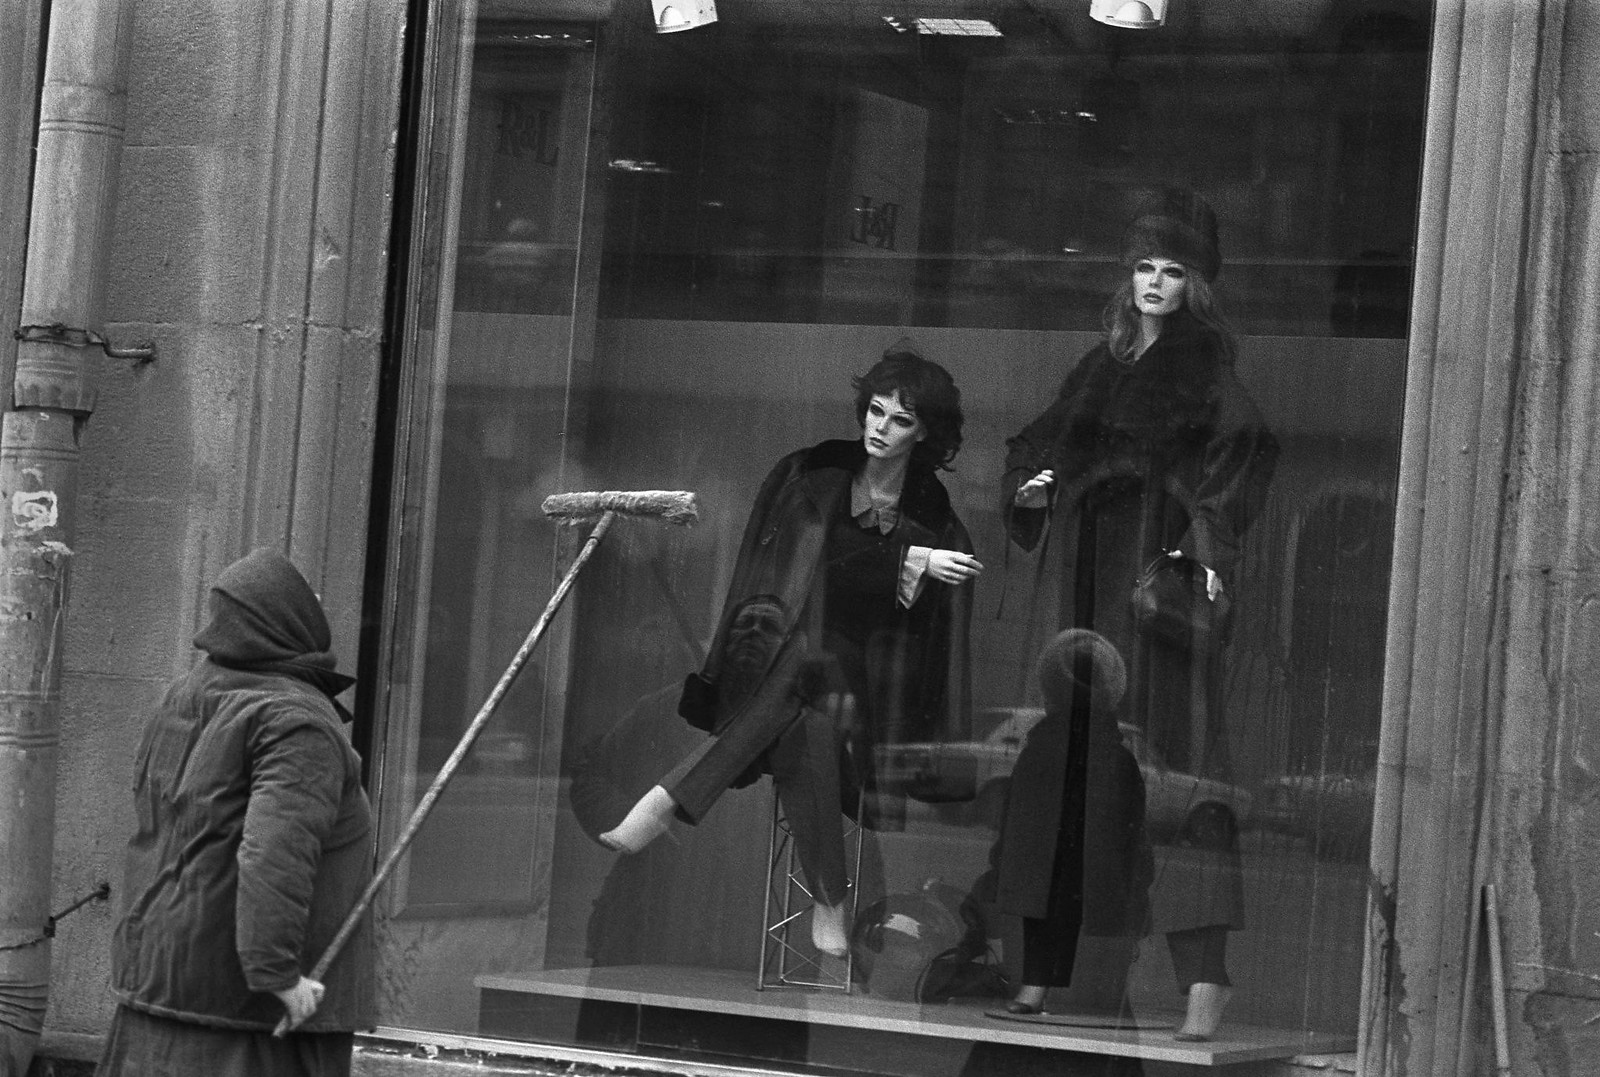 1960-е. Шубы и телогрейки